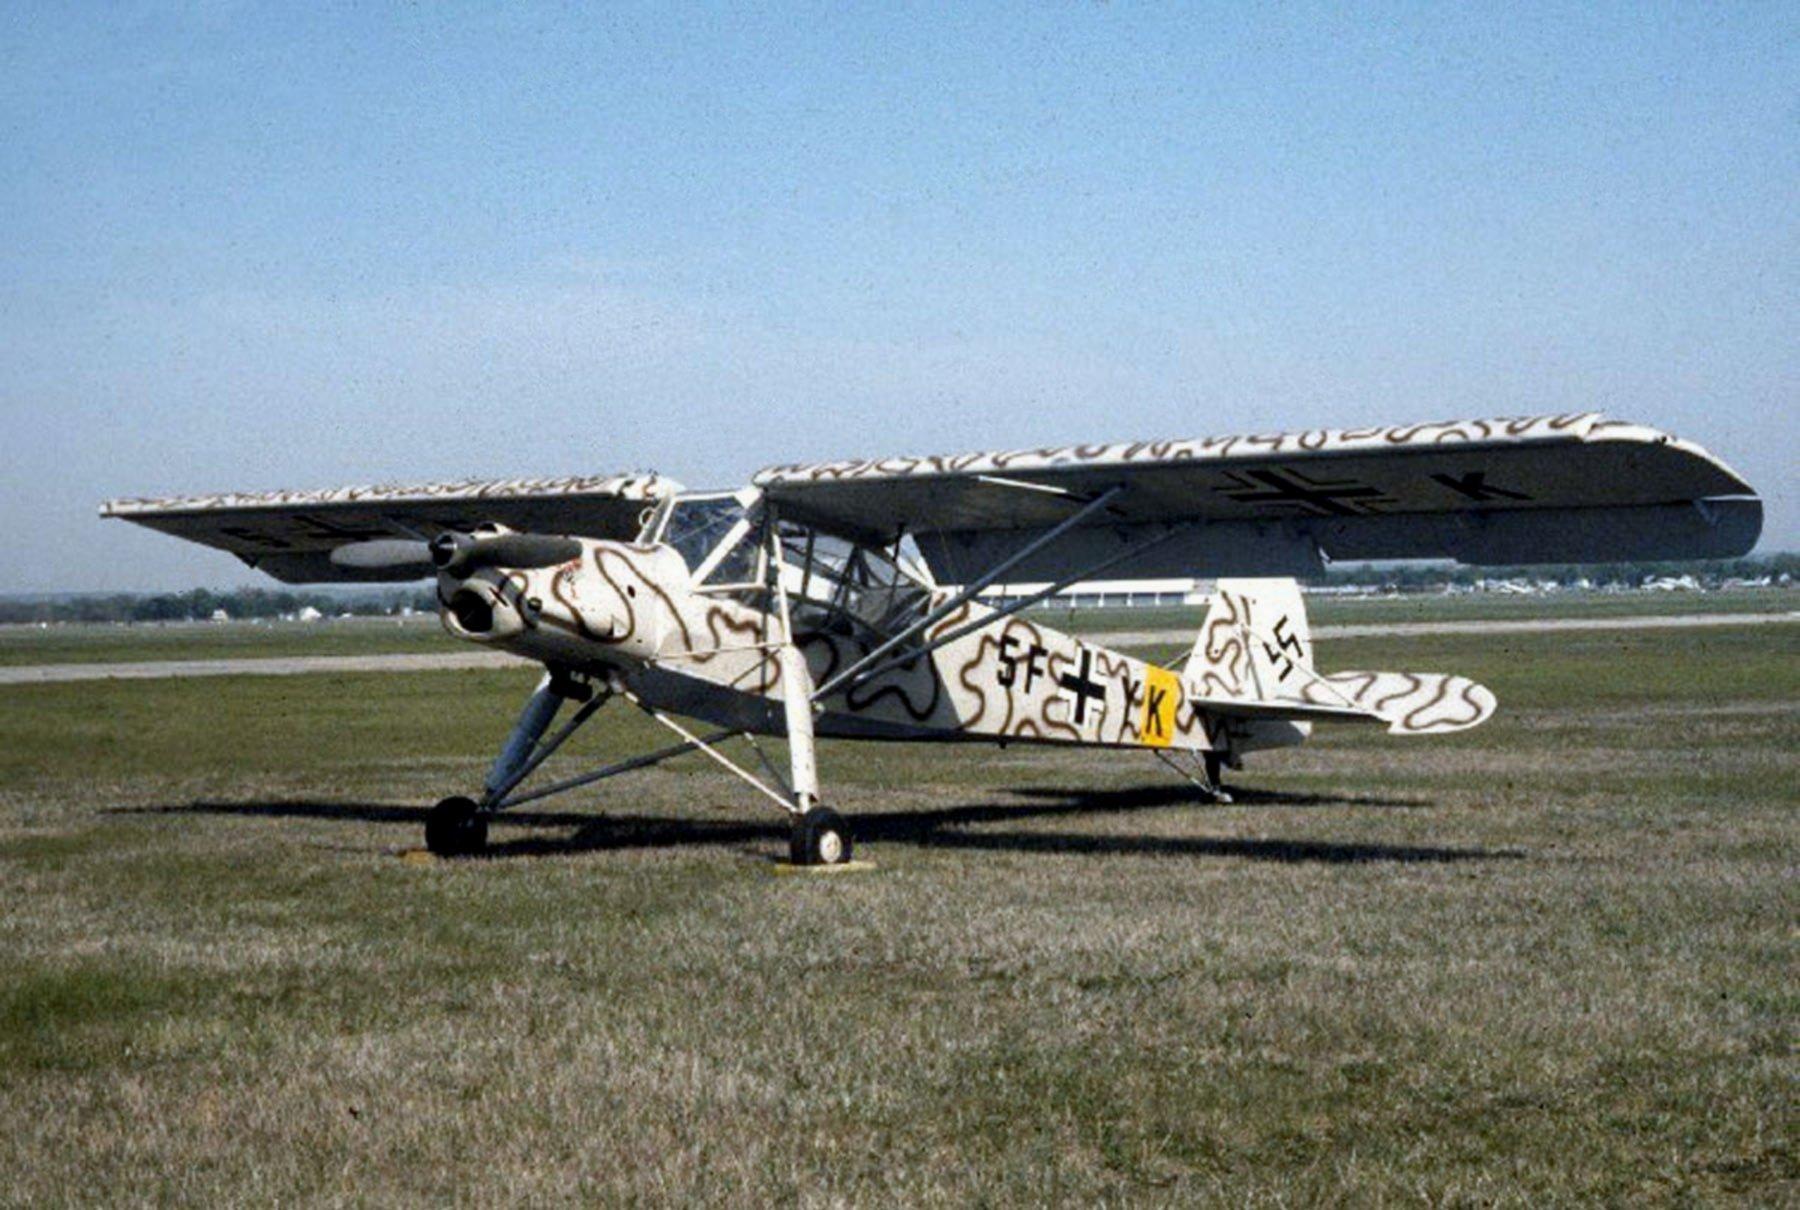 Fieseler Fi 156C-1 Storch (image d'illustration)